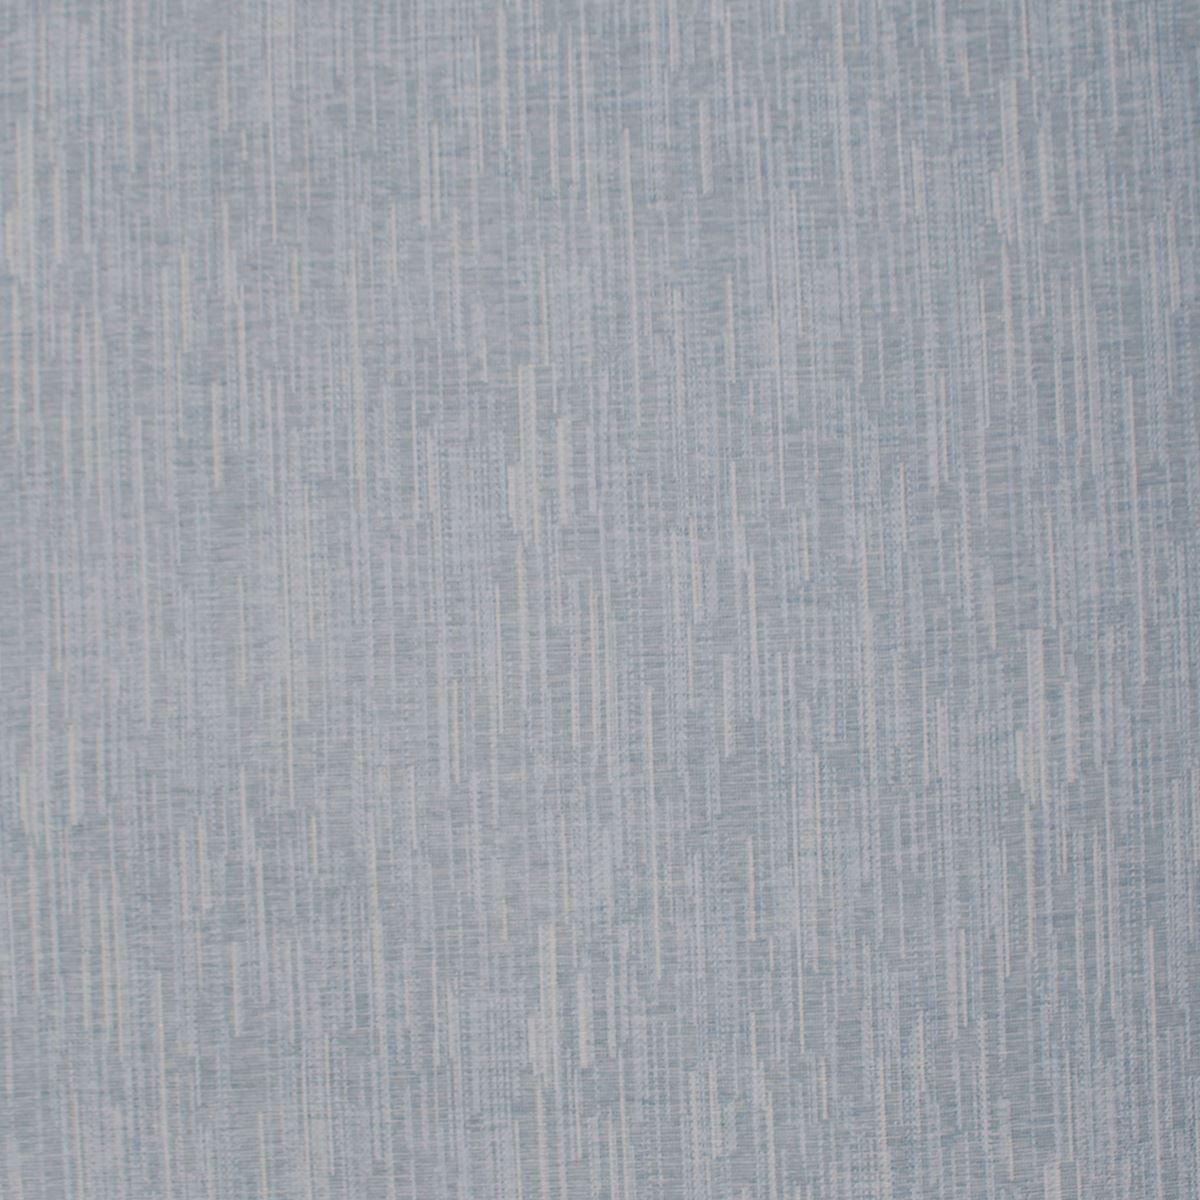 034-Chenille-034-Slubbed-Shabby-Worn-Look-Curtain-Cushion-Sofa-Upholstery-Fabric thumbnail 59